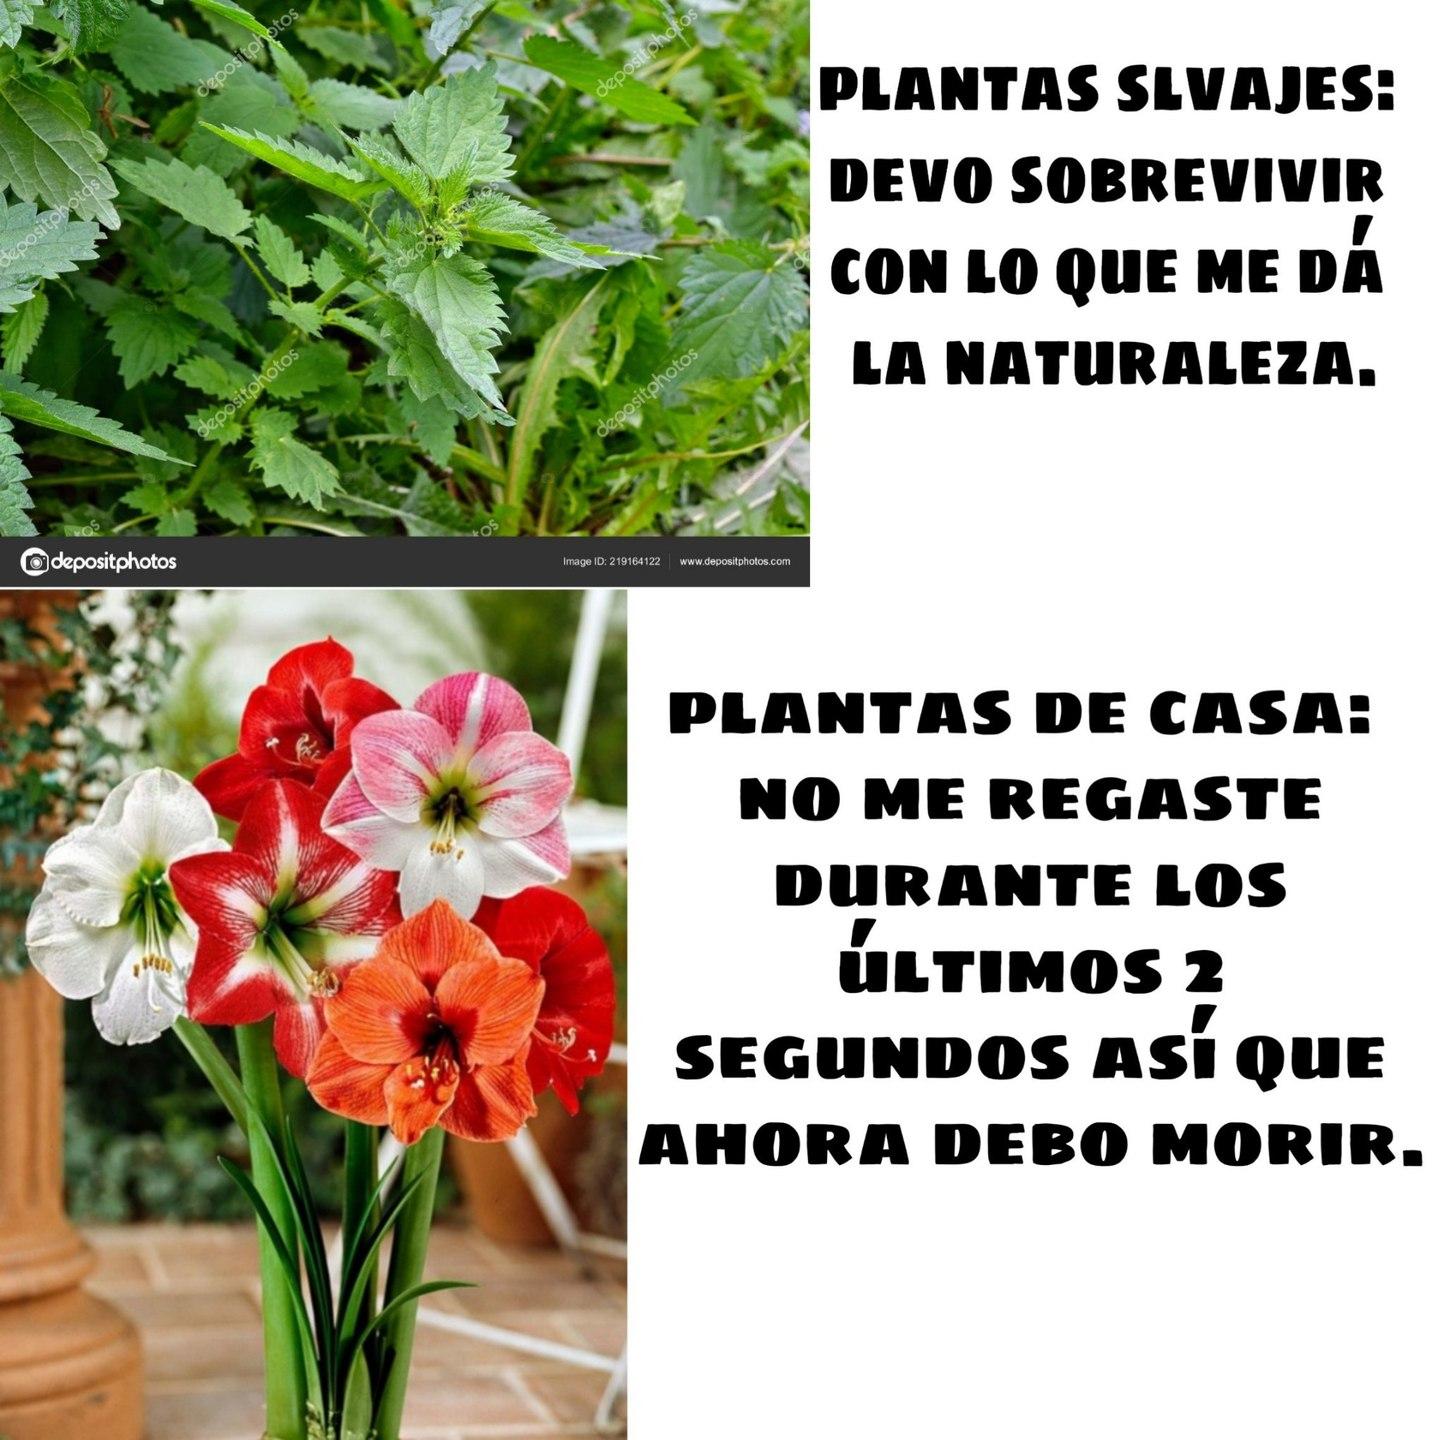 Plantas - meme